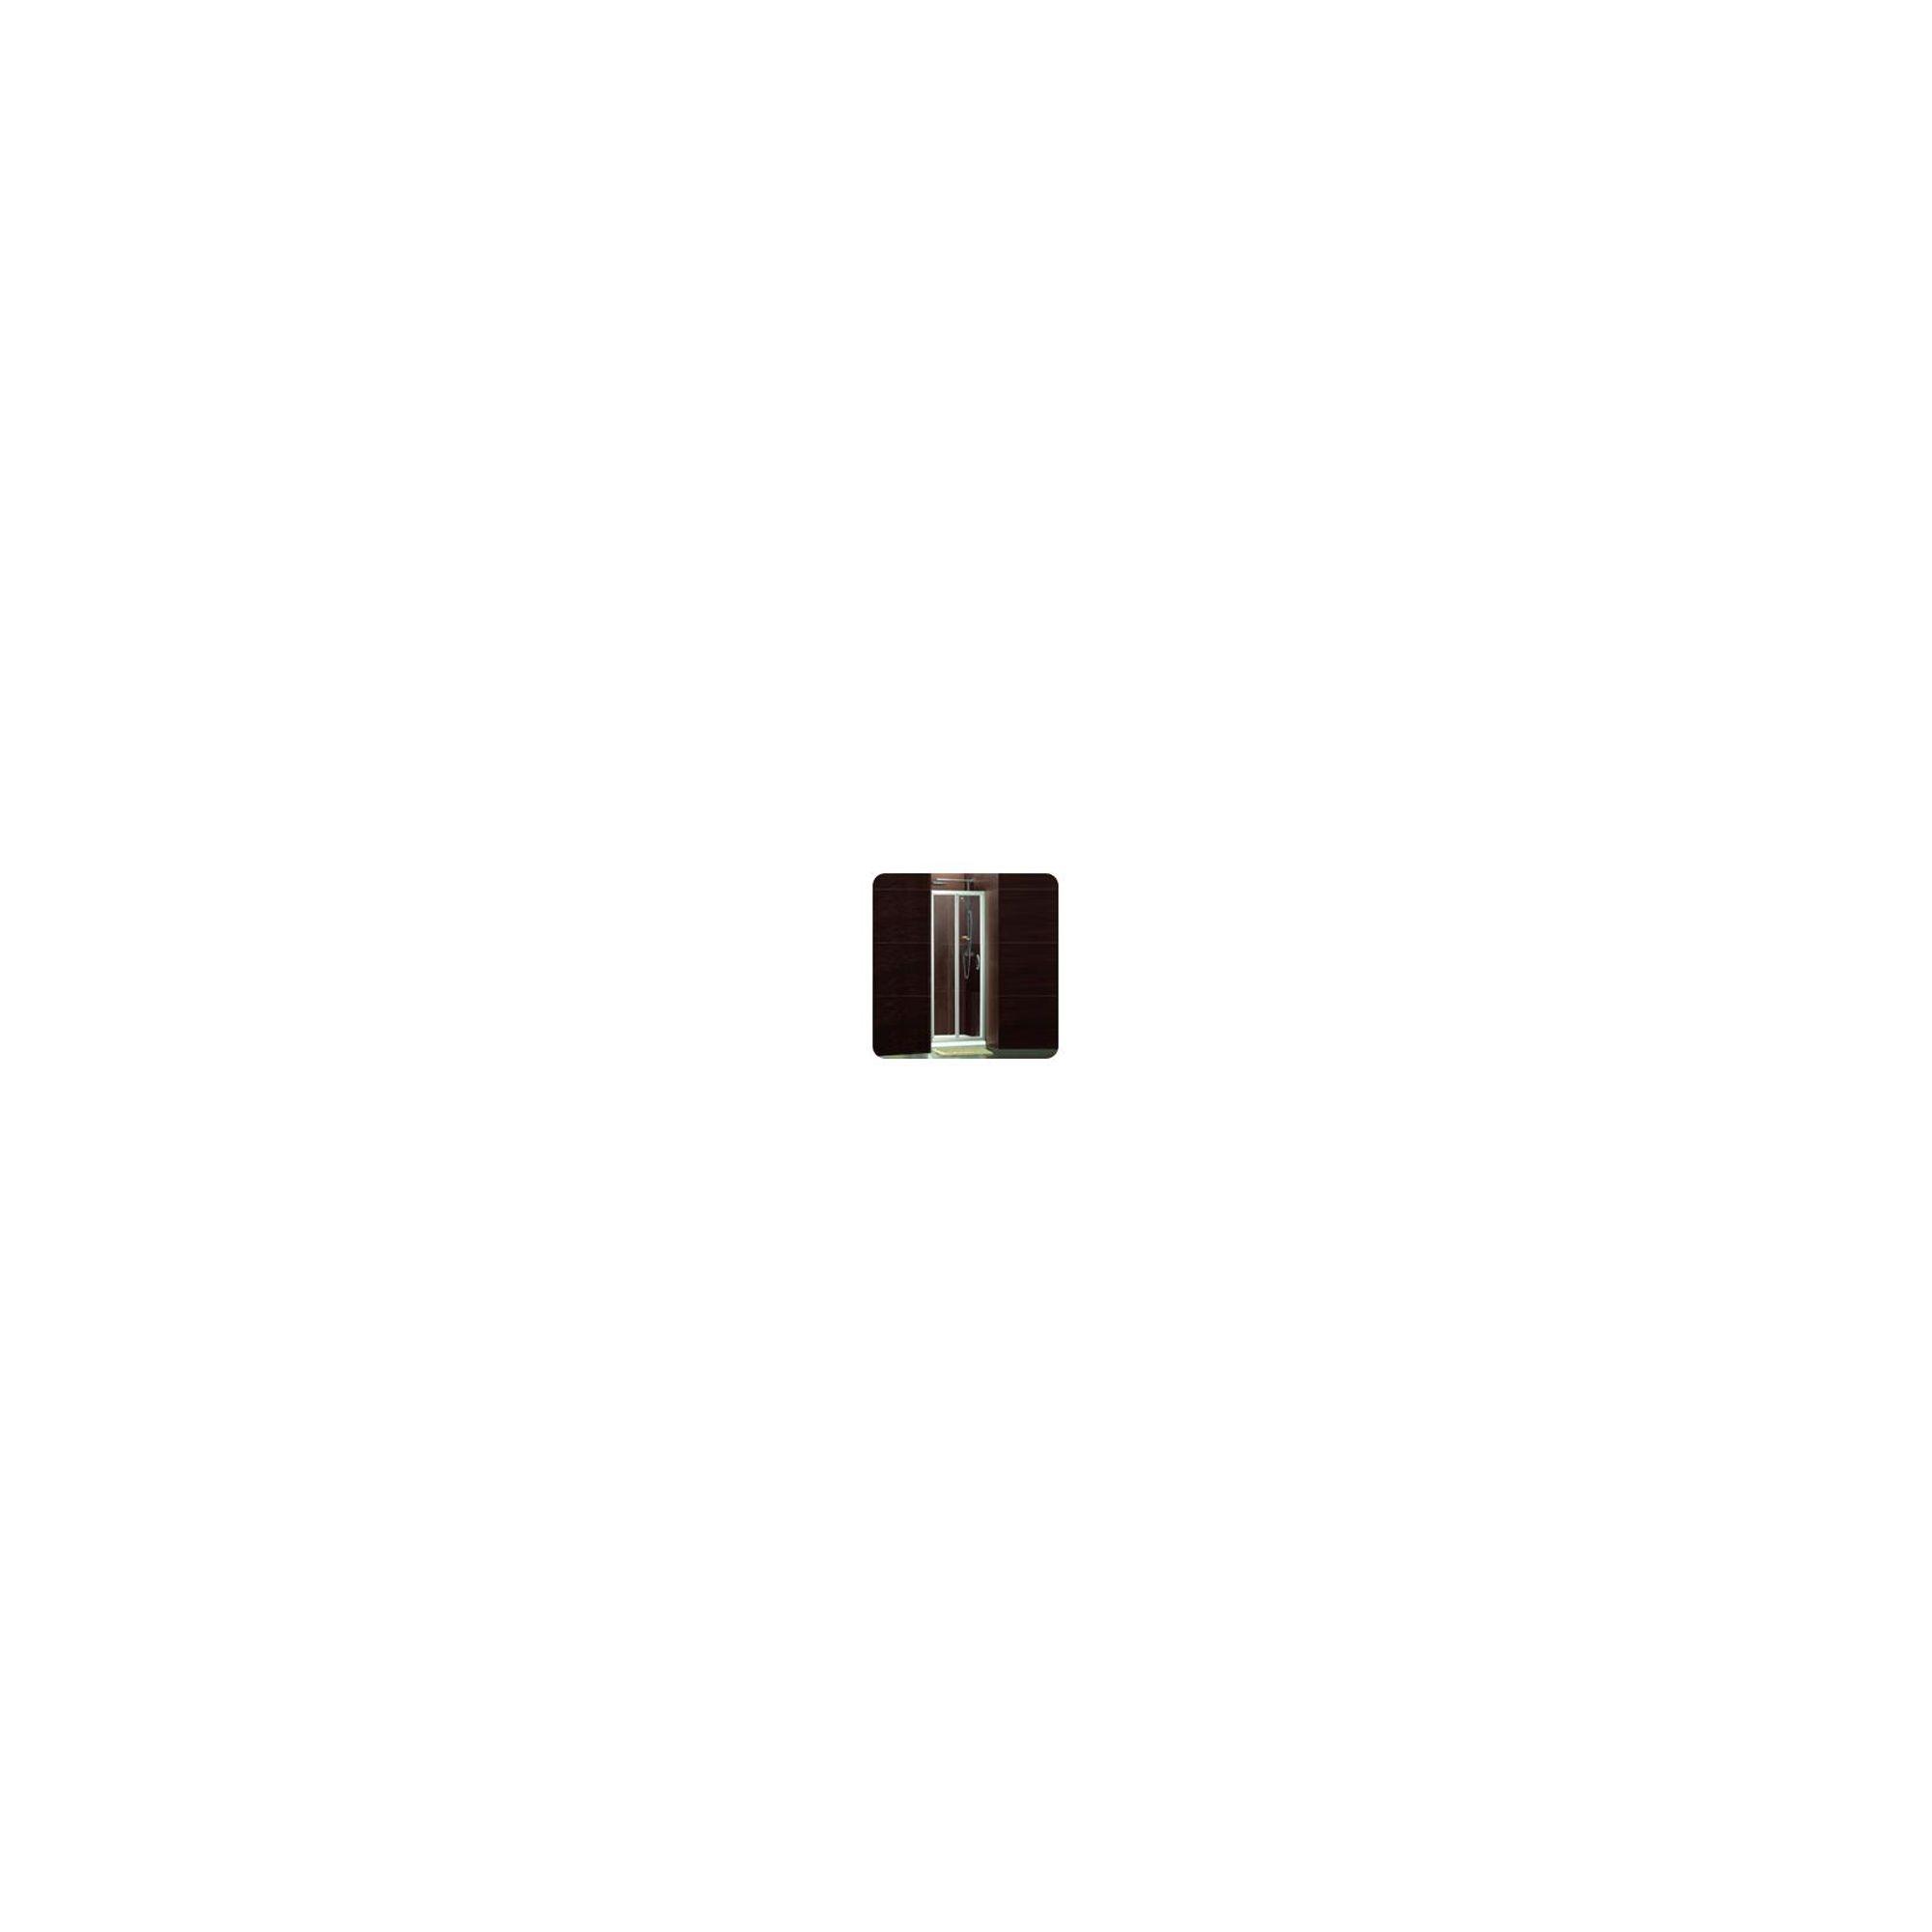 Balterley Framed ALCOVE Bi-Fold Shower Enclosure, 900mm x 900mm, Standard Tray, 6mm Glass at Tesco Direct